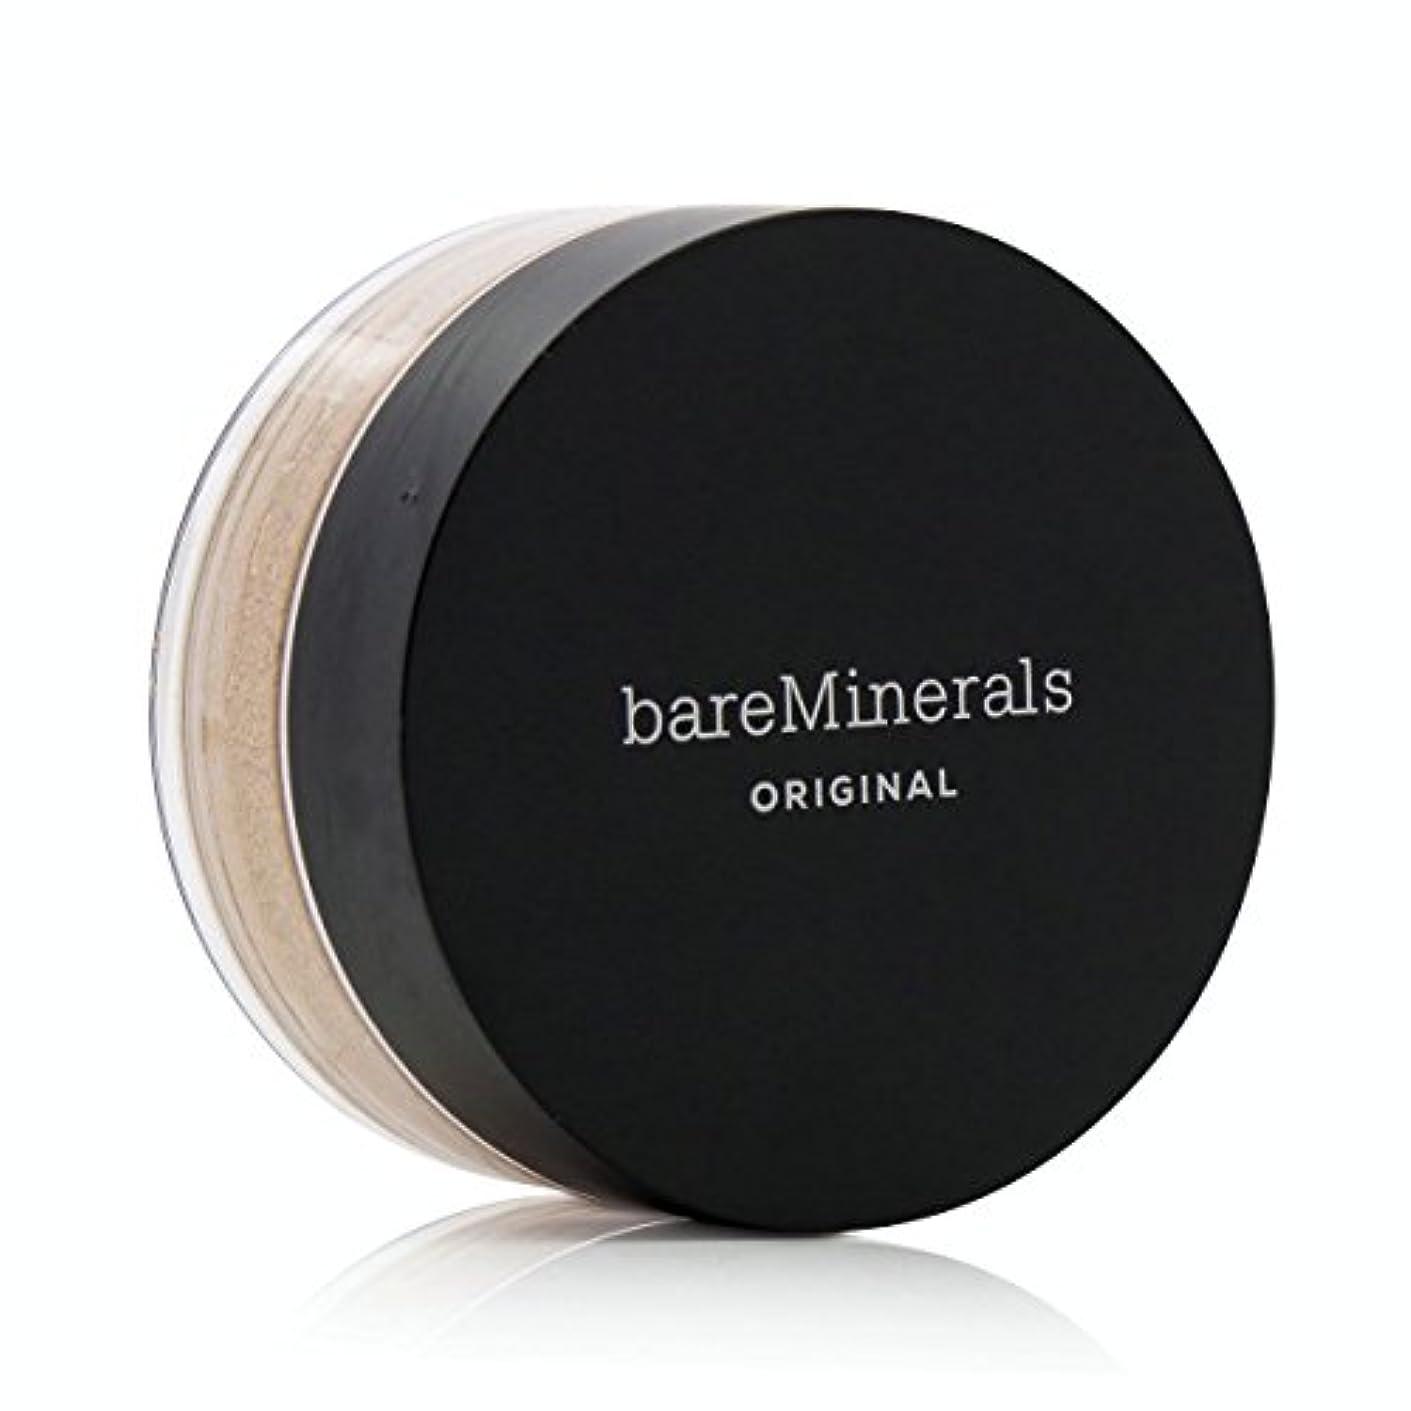 [BareMinerals(ベアミネラル)] ベアミネラルオリジナルSPF 15ファンデーション - #フェアアイボリー 8g/0.28oz